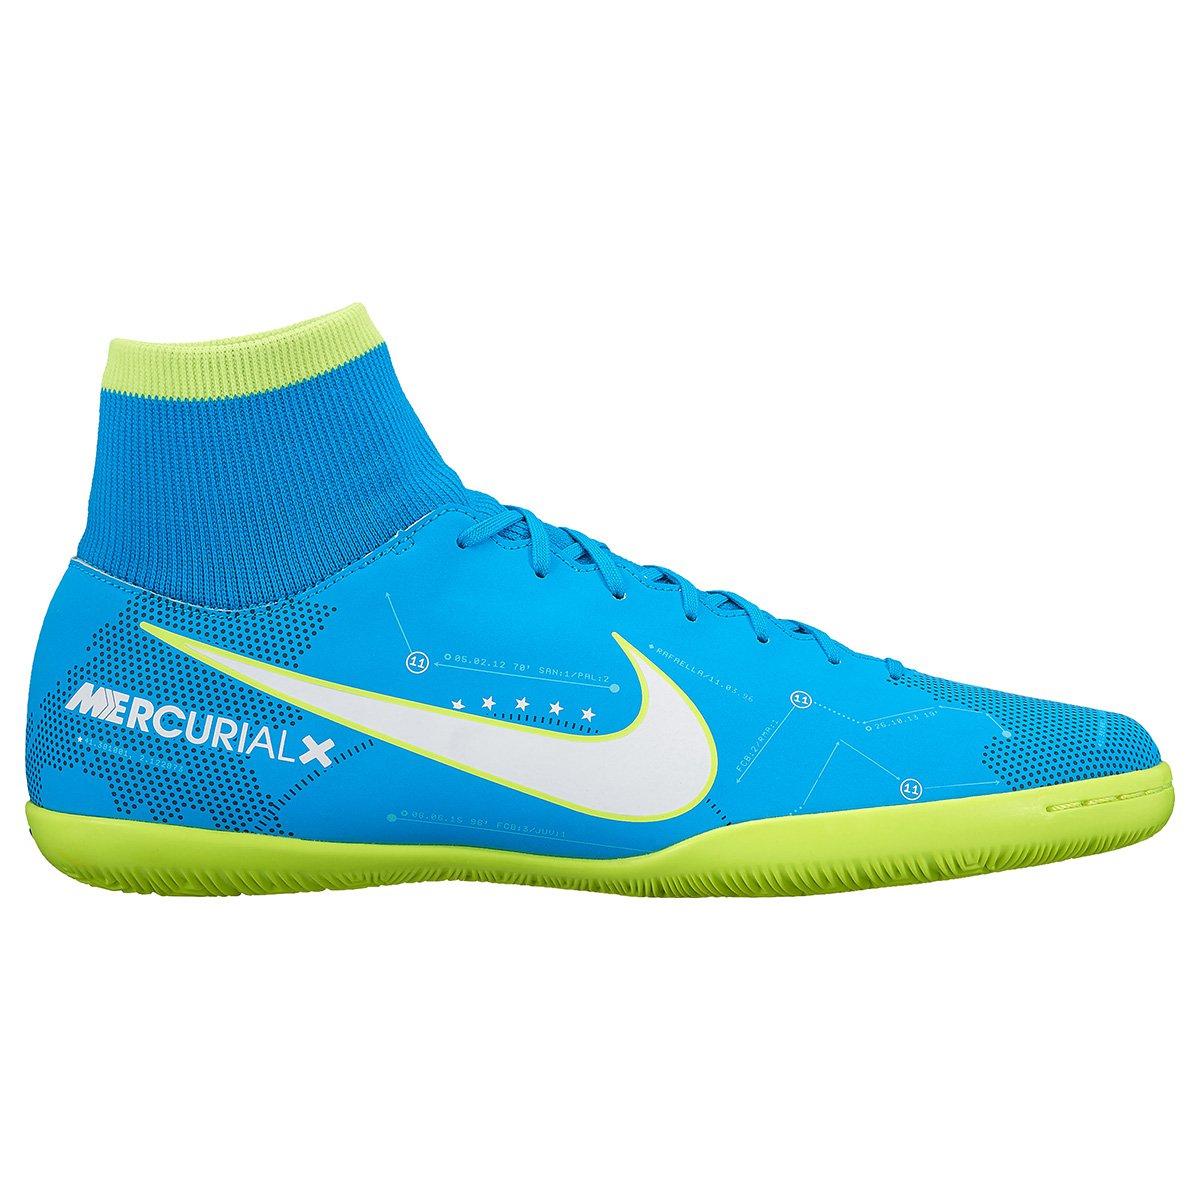 Chuteira Futsal Nike Mercurial Victory 6 DF Neymar Jr IC - Compre ... 2dc7a54e3a474